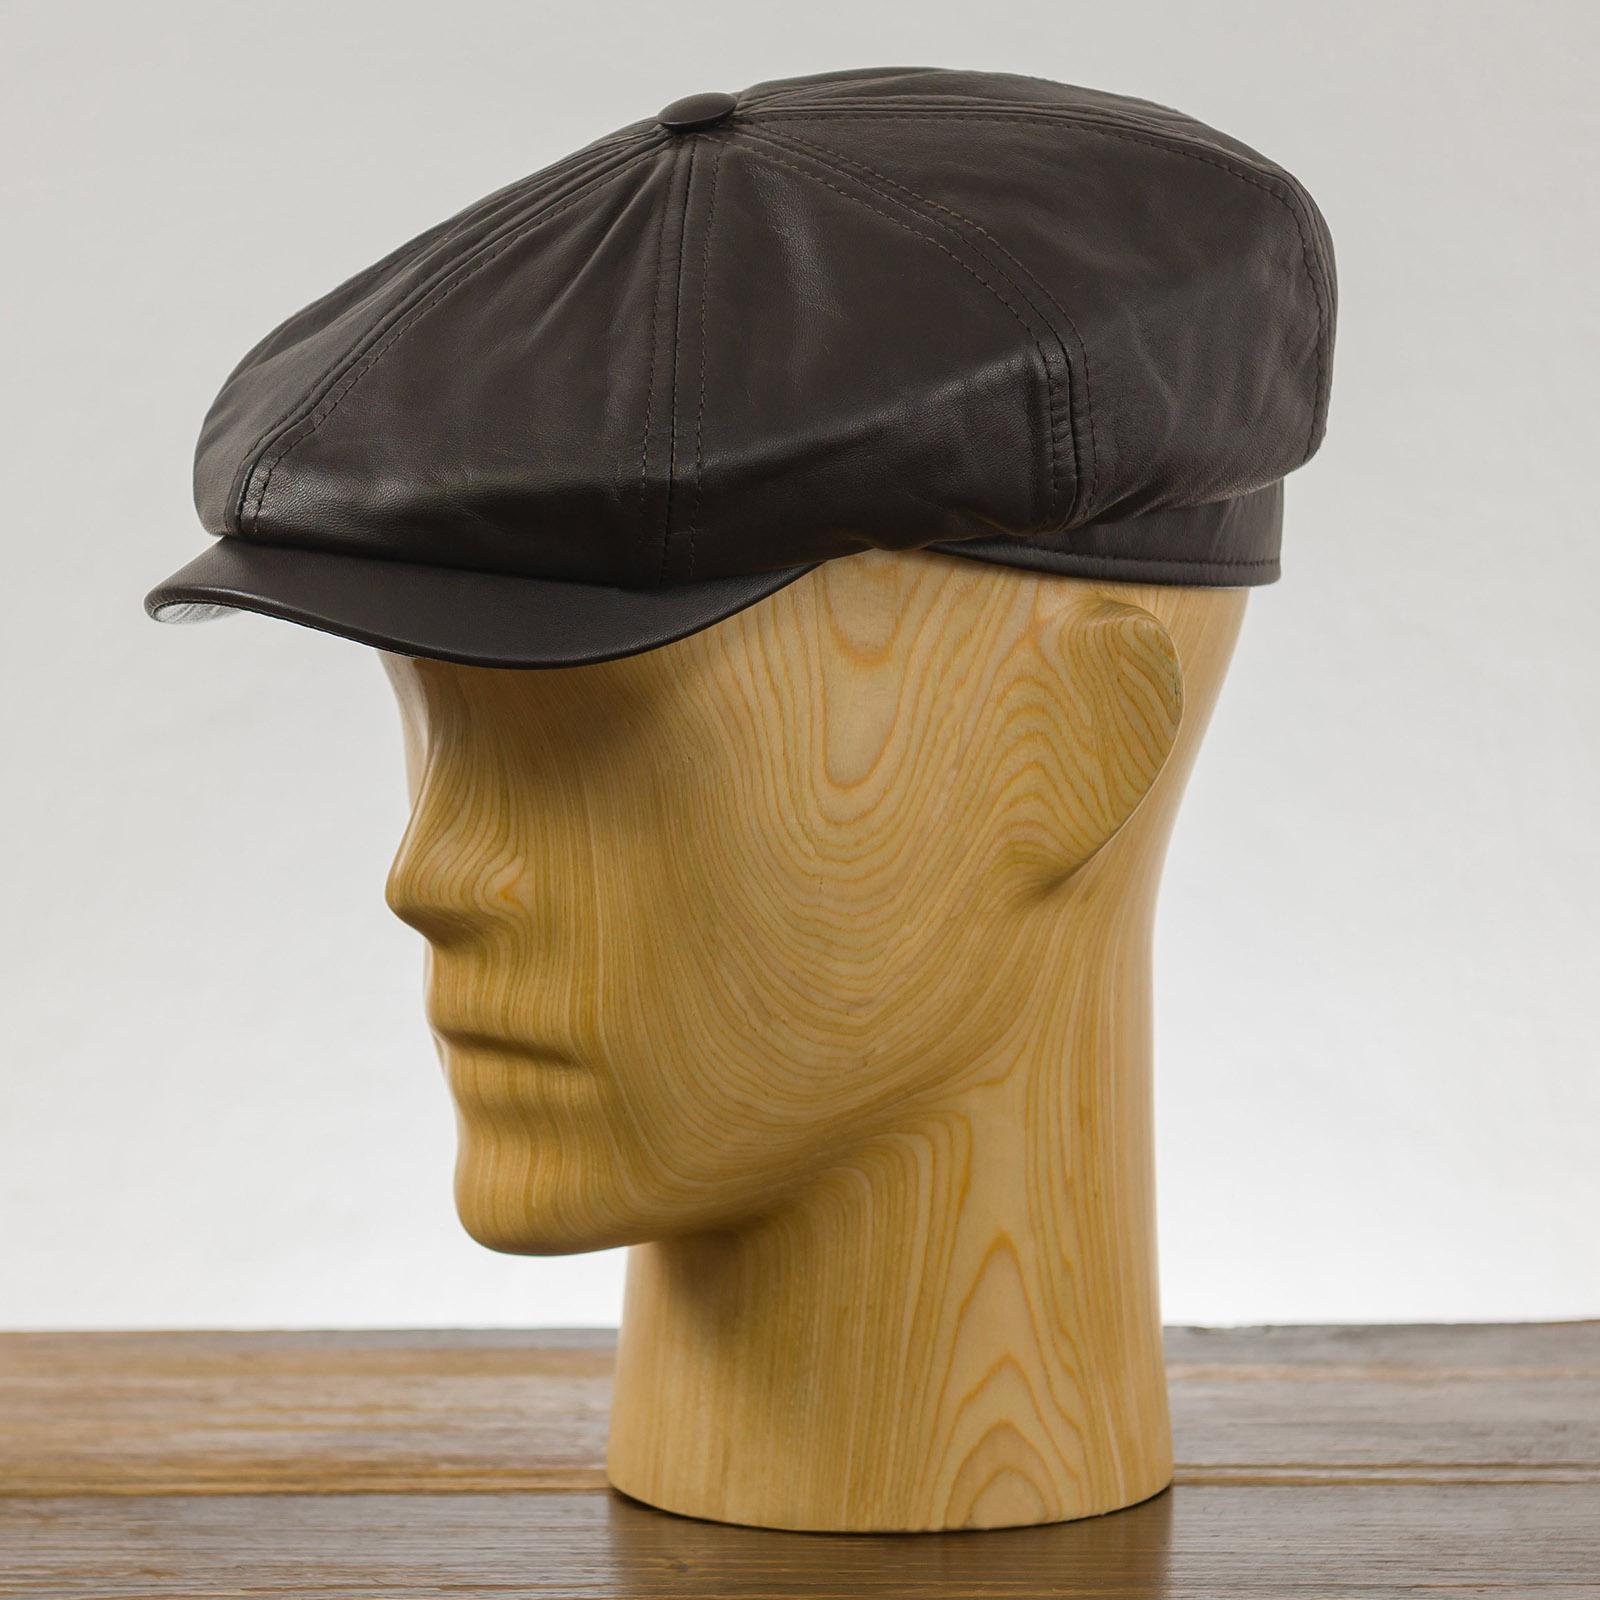 Genuine Leather Gatsby baker boy hat newsboy poor boy applejack paper boy ivy league